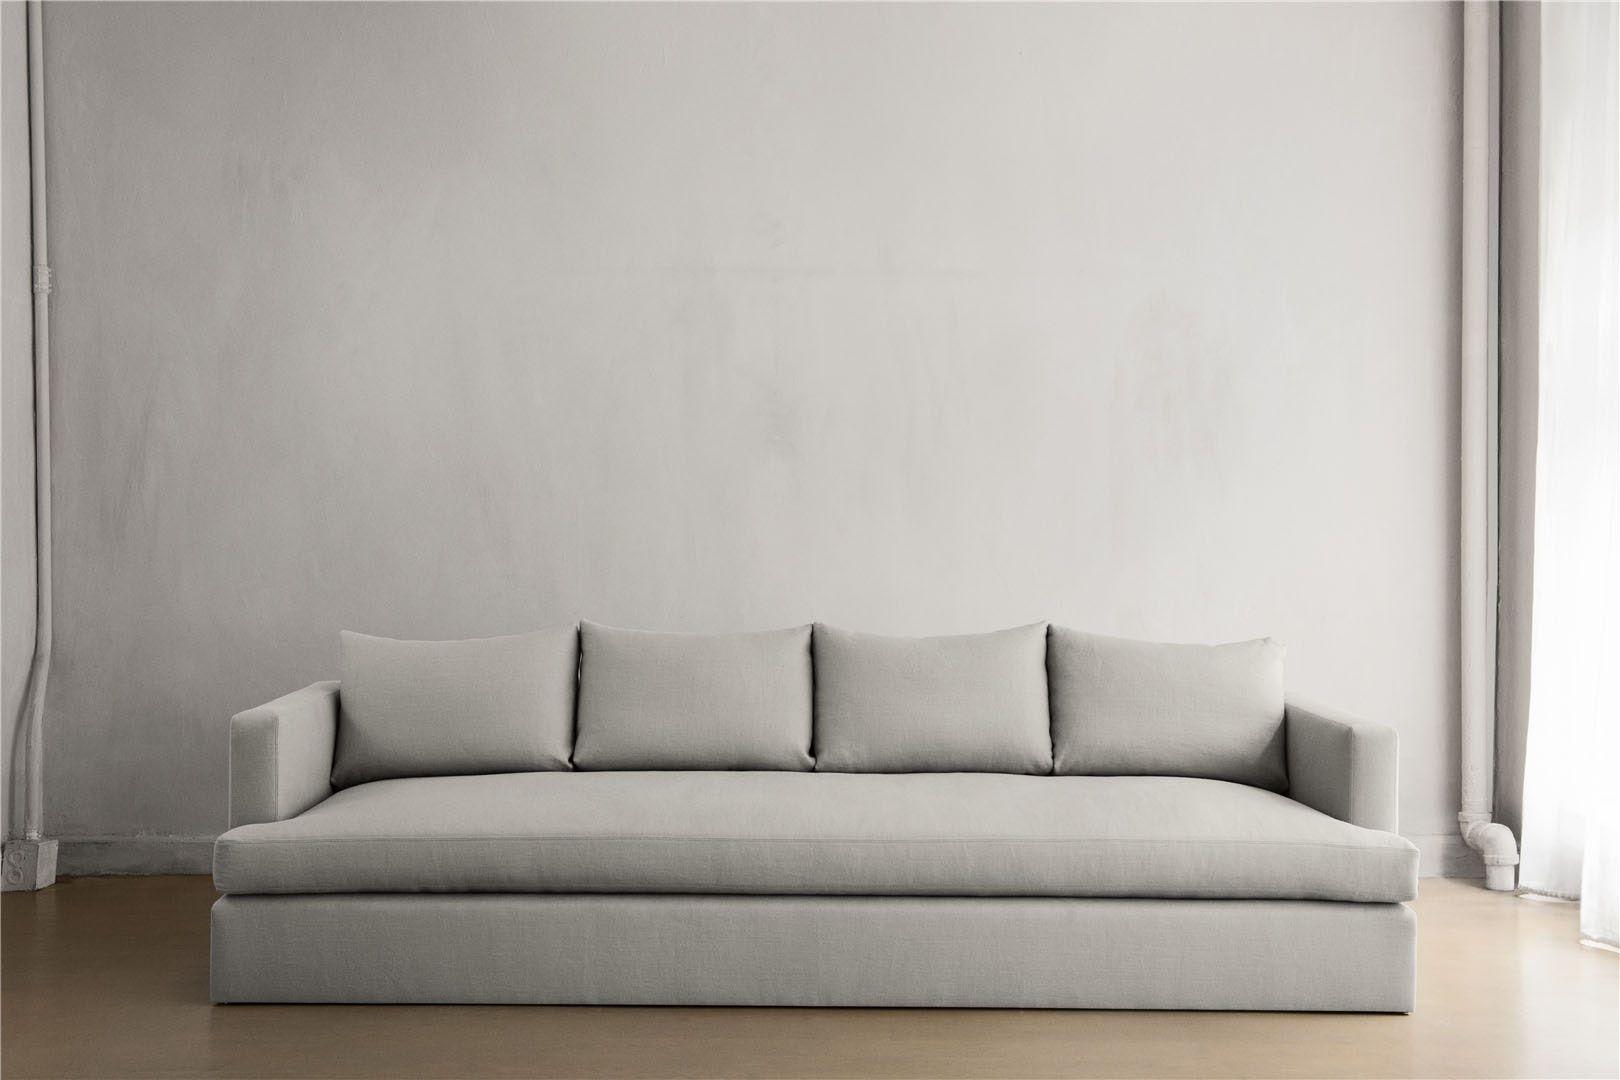 Chelsea Square Sofa Forest Green Pillows Dmitriy Co Bella Vista Laurel Living Room